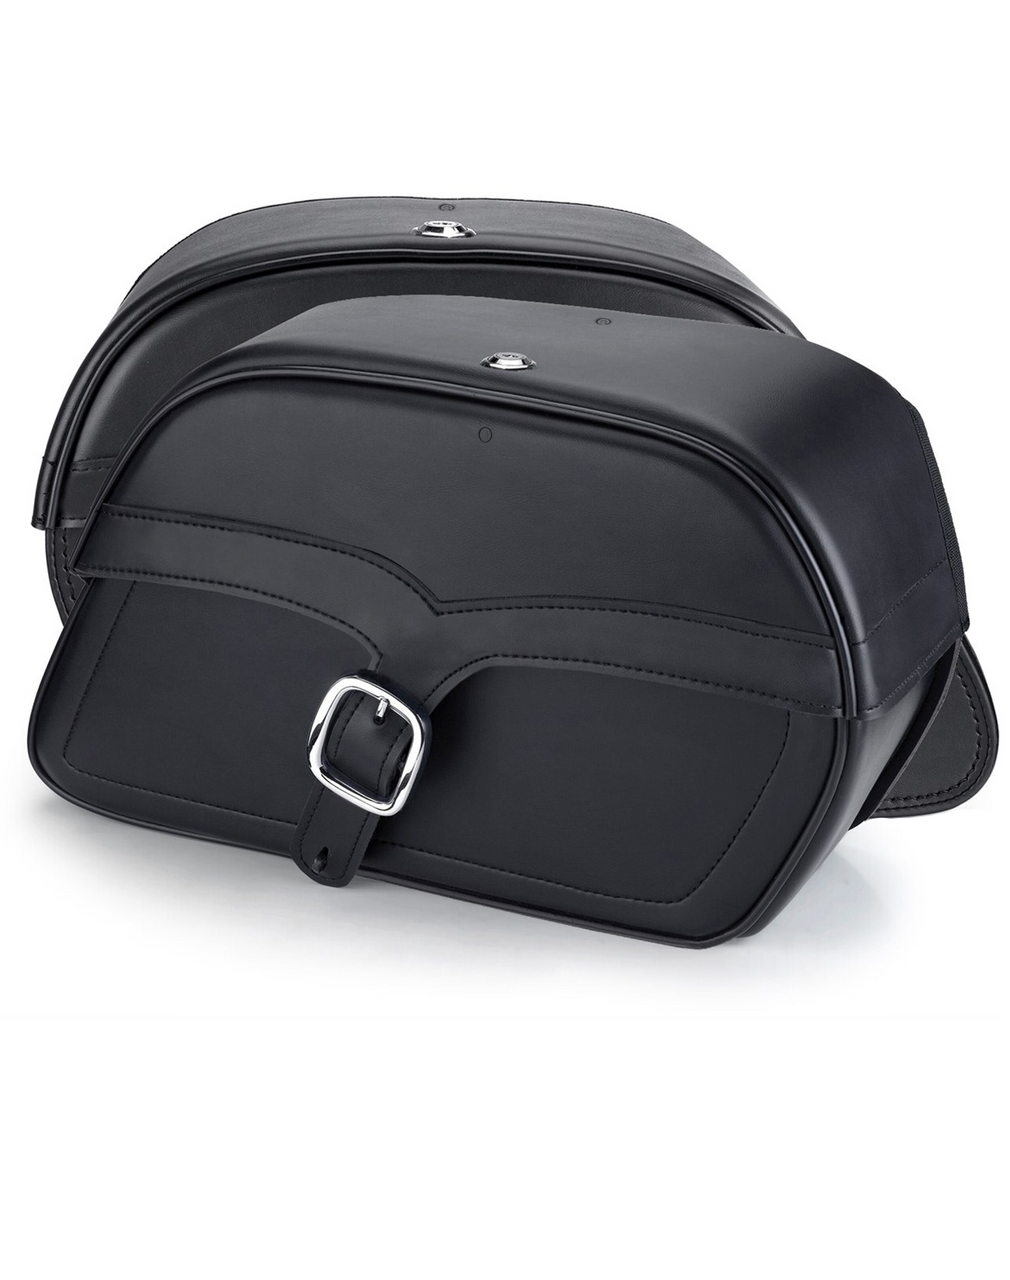 Honda VTX 1800 N Medium Charger Single Strap Motorcycle Saddlebags Both Bags View